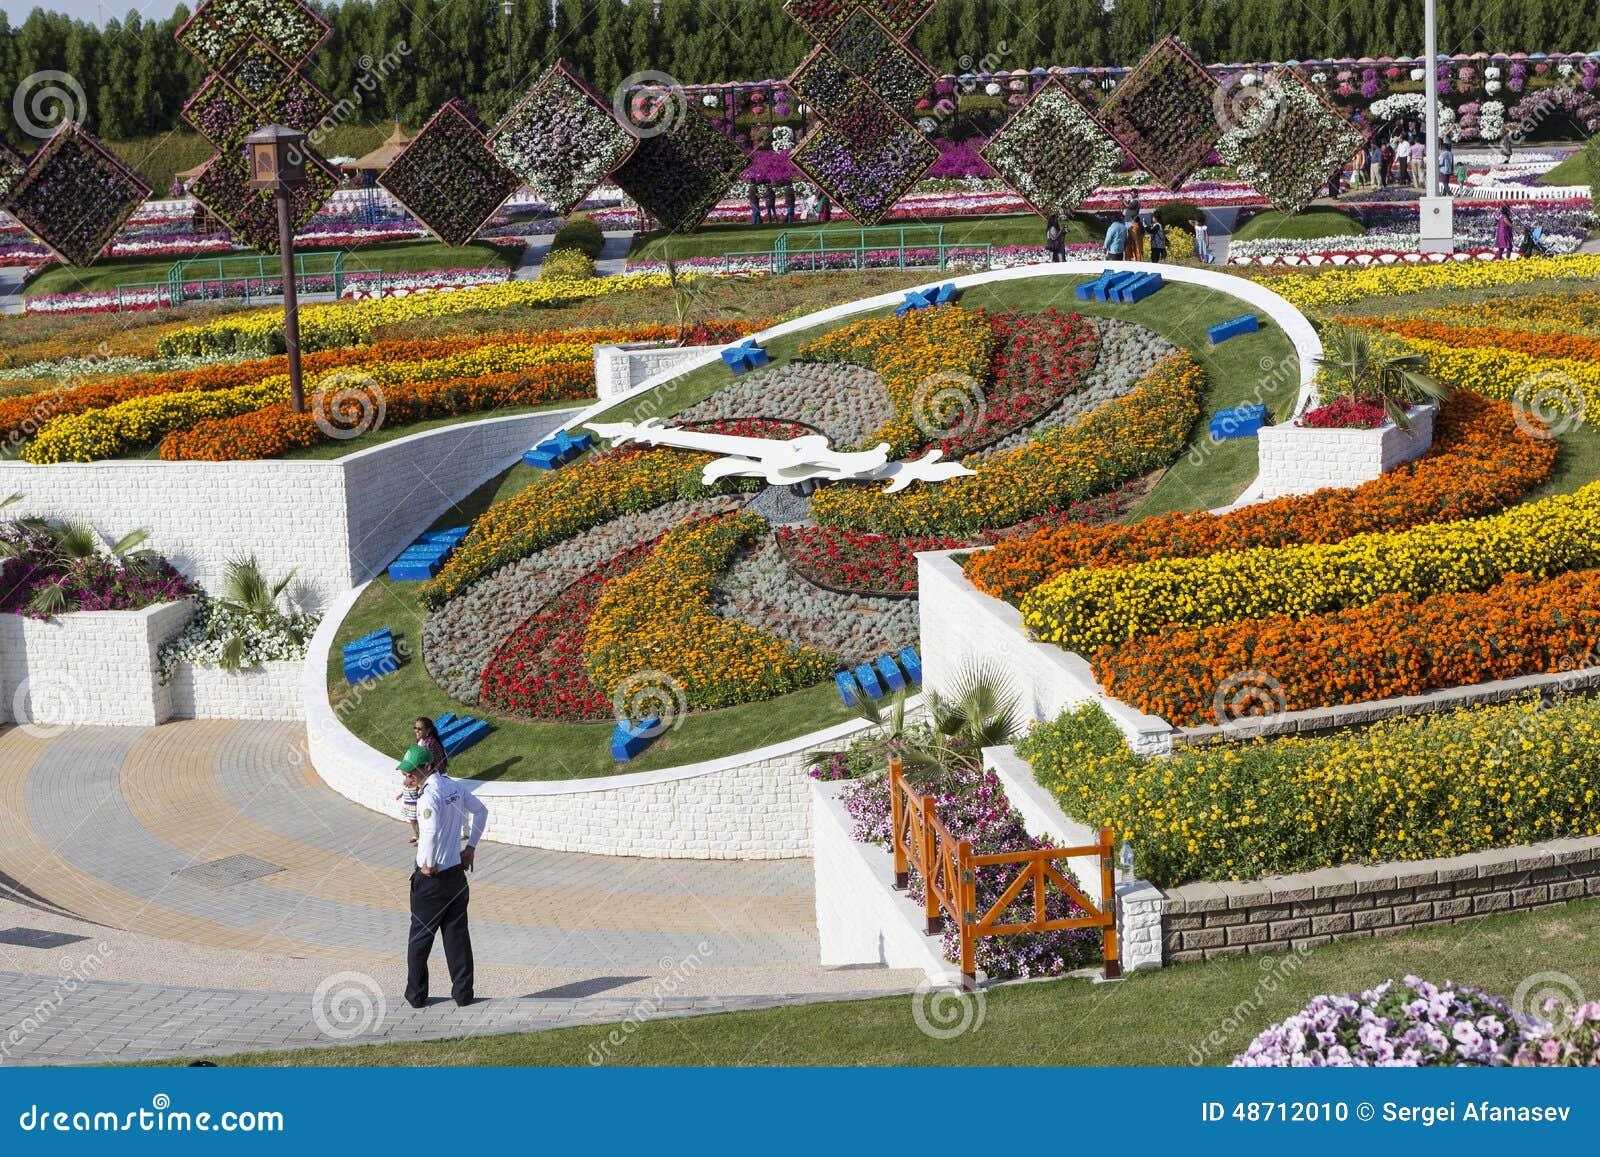 Flower park in dubai dubai miracle garden united arab for Home garden design dubai